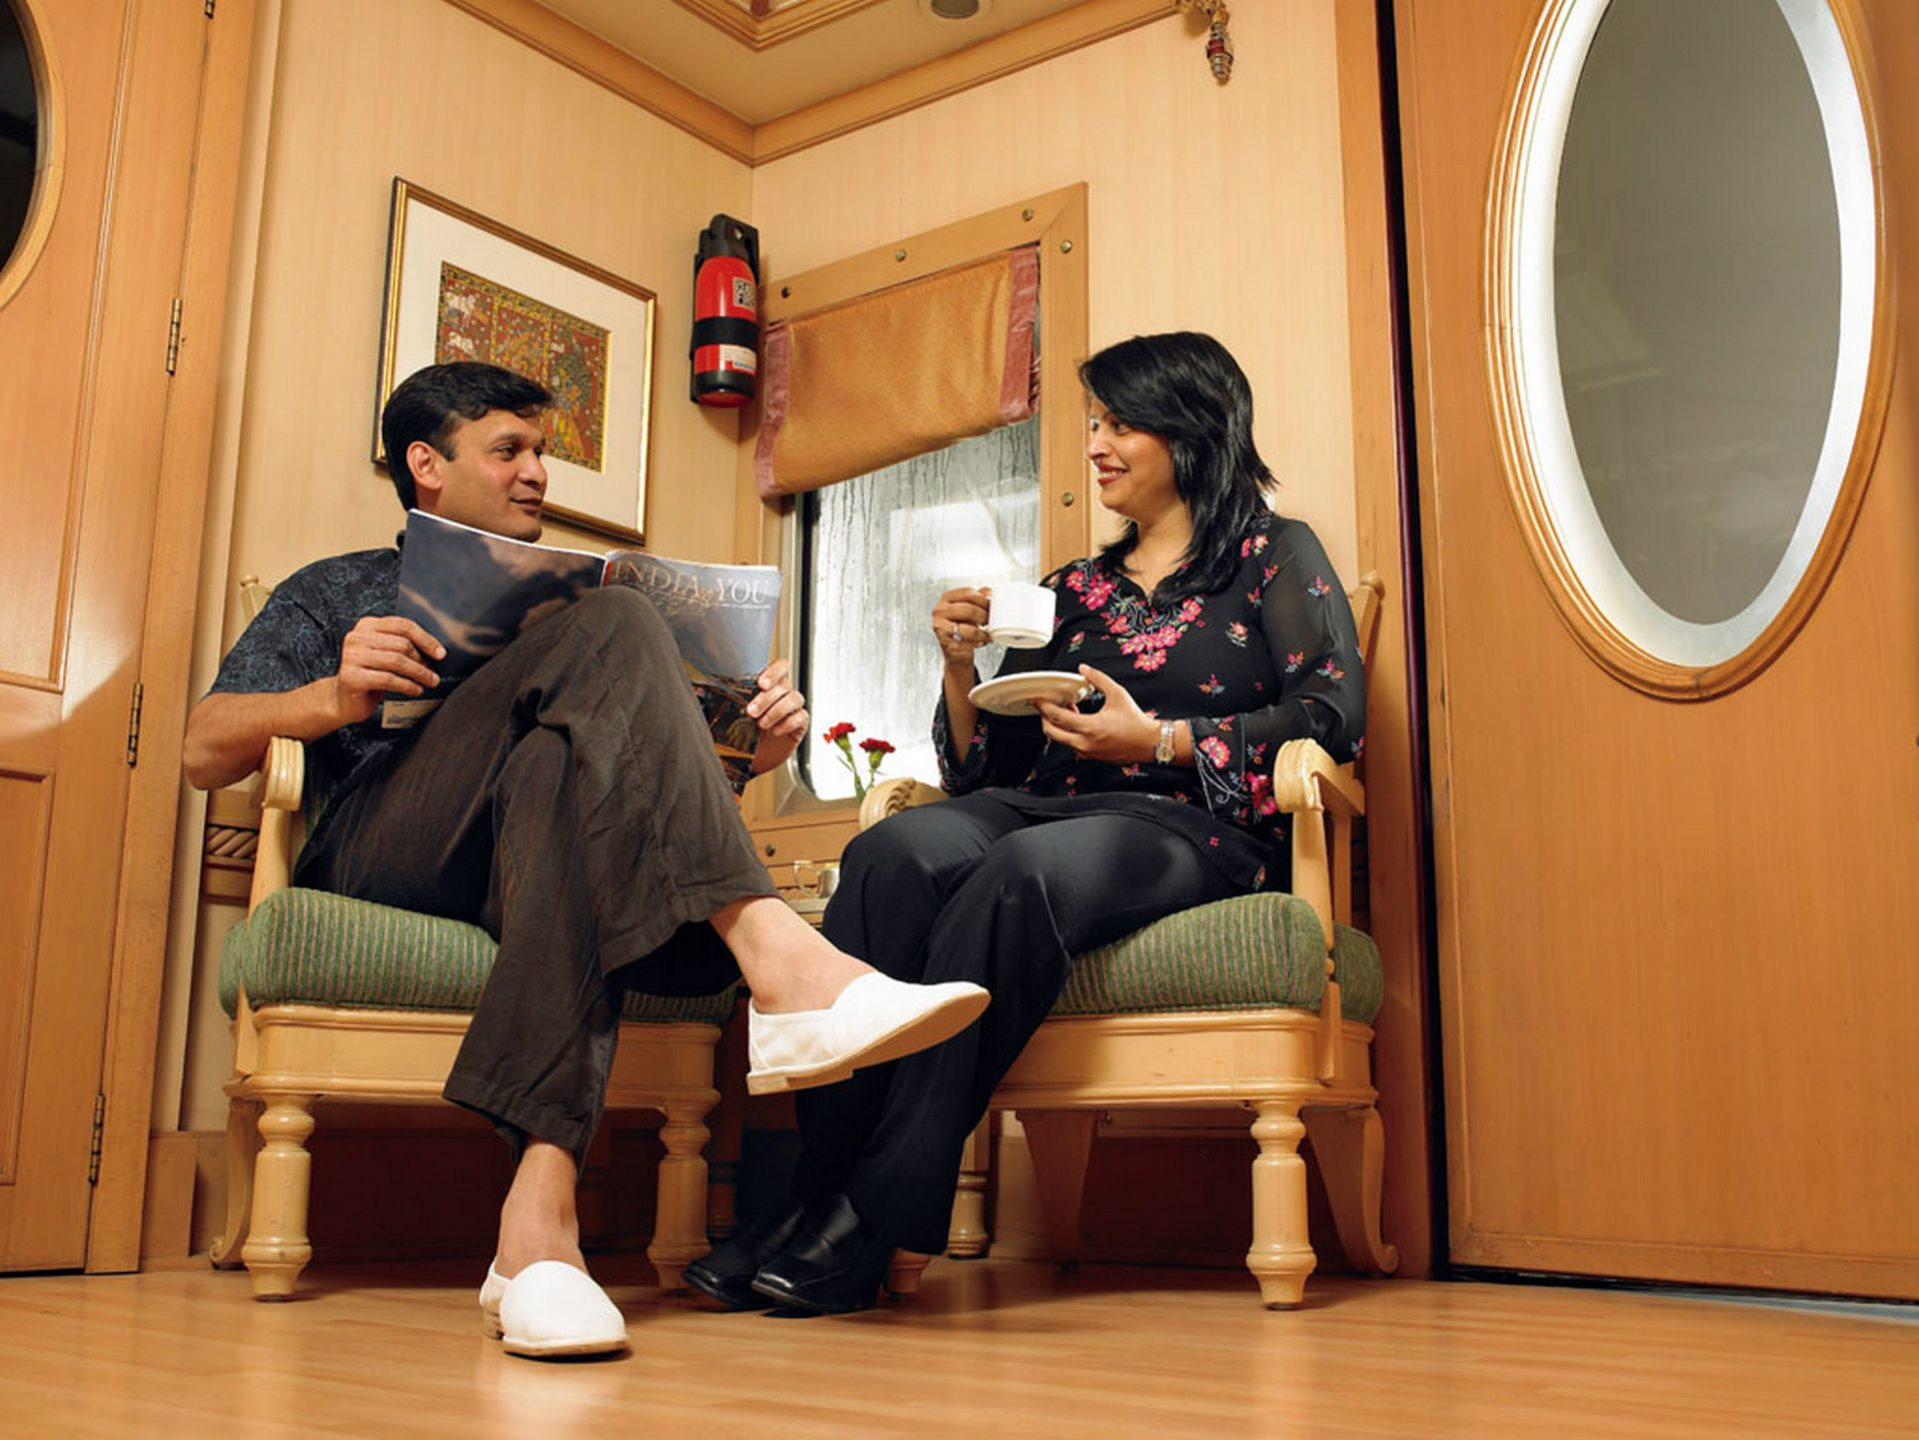 NOMAD-luksusowe-pociągi-Golden-Chariot-Indie-04-1